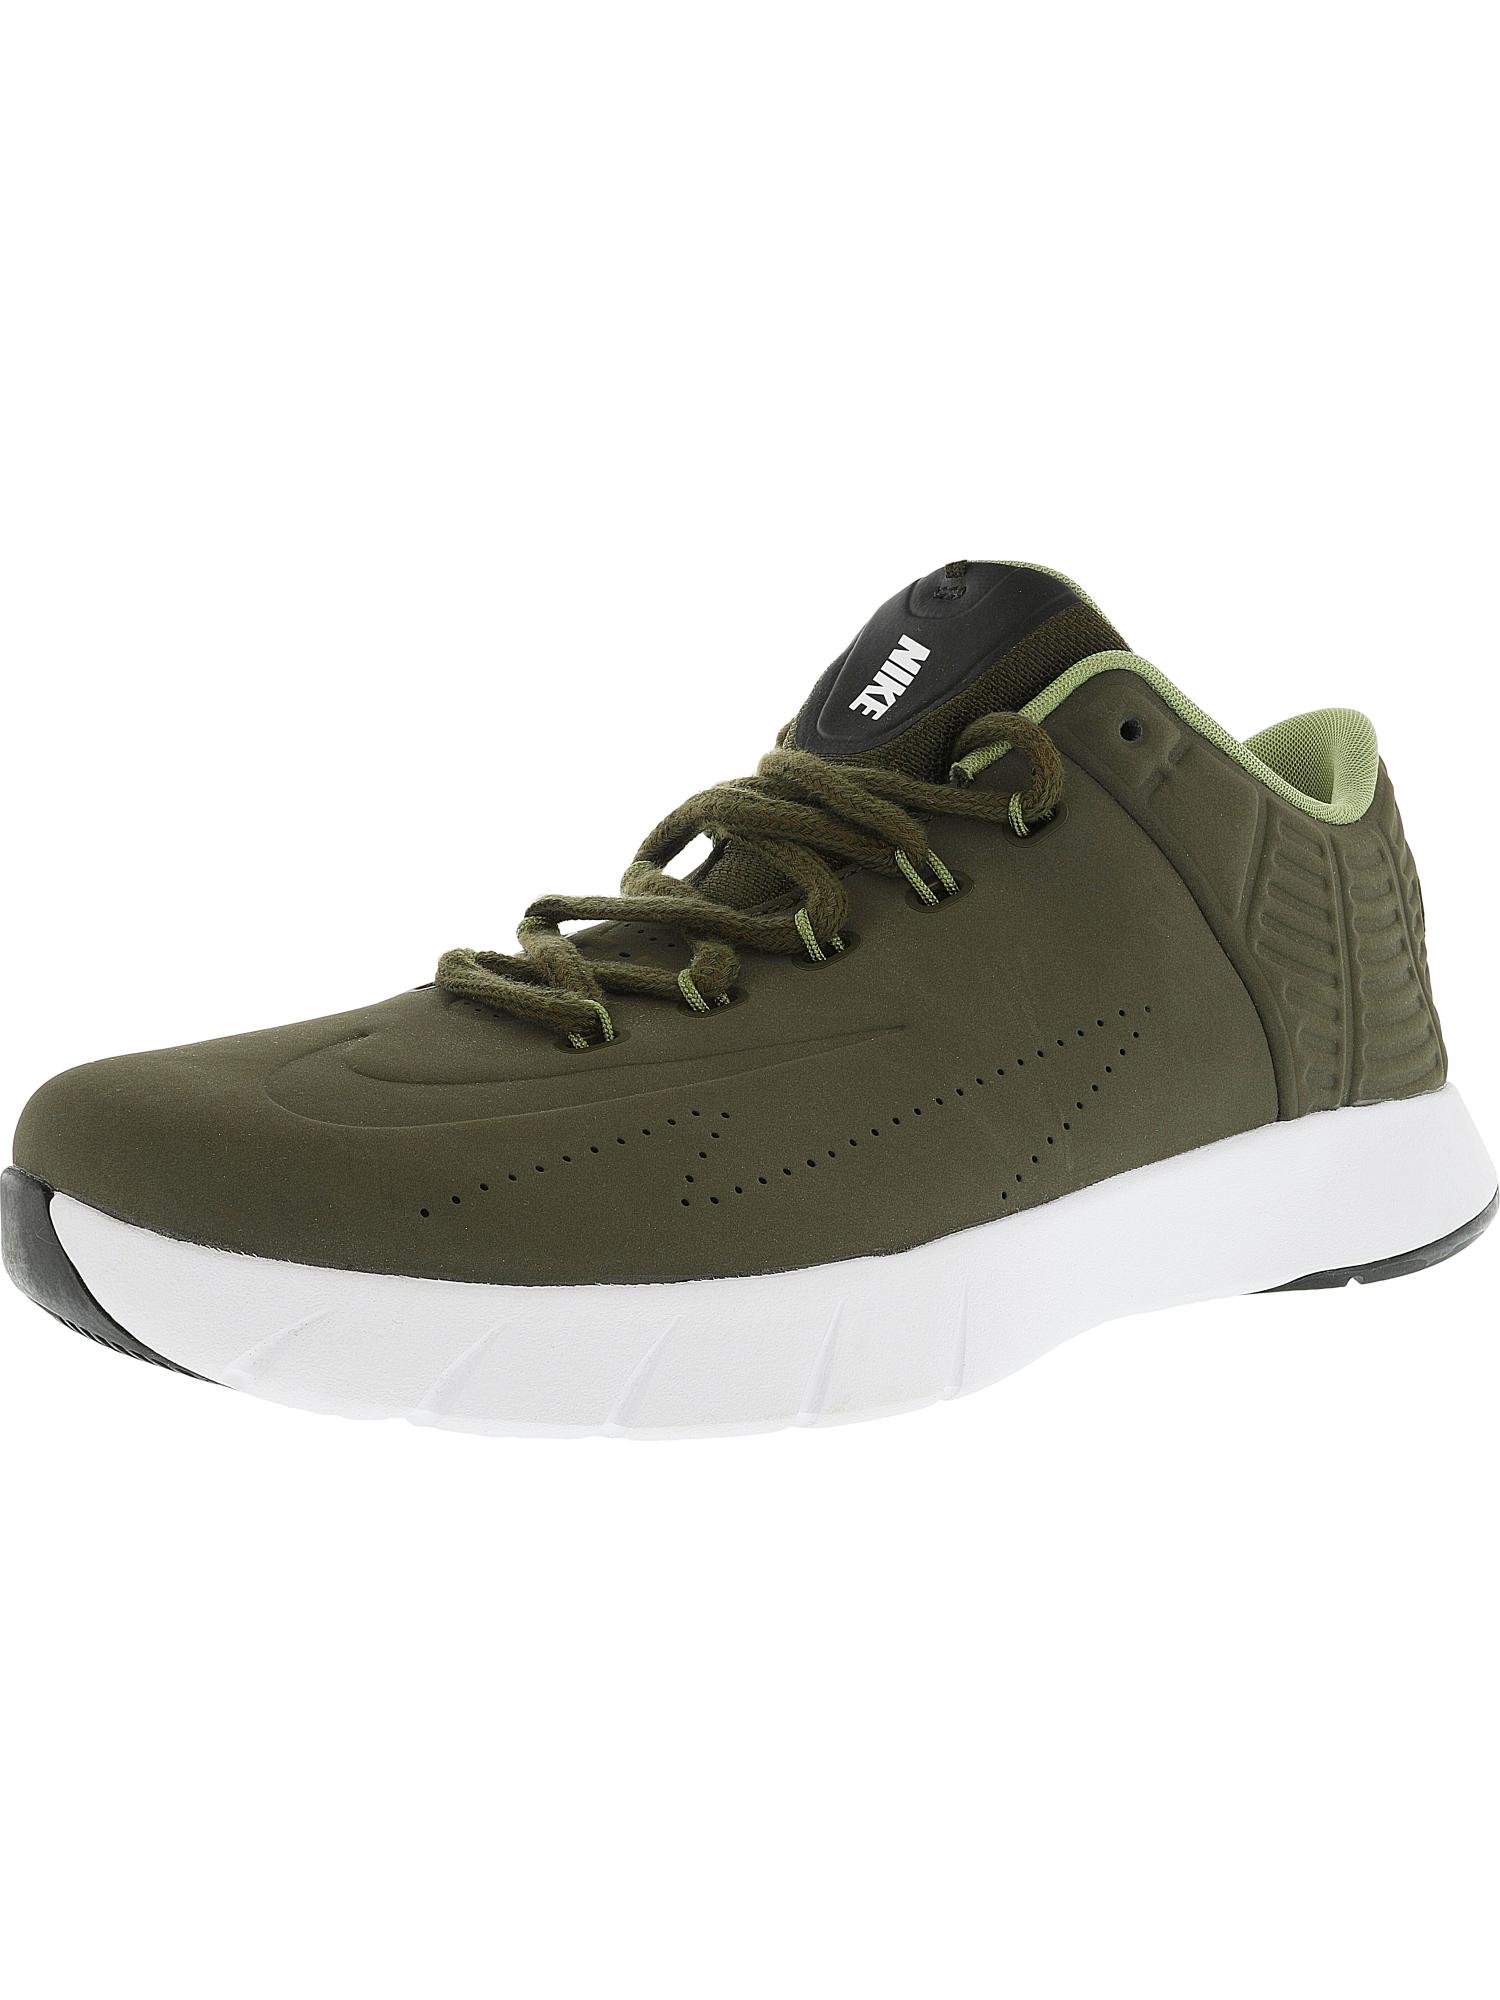 pretty nice 6bda8 2e553 ... Nike Men s 802557 802557 802557 Ankle-High Running Shoe 45457c ...